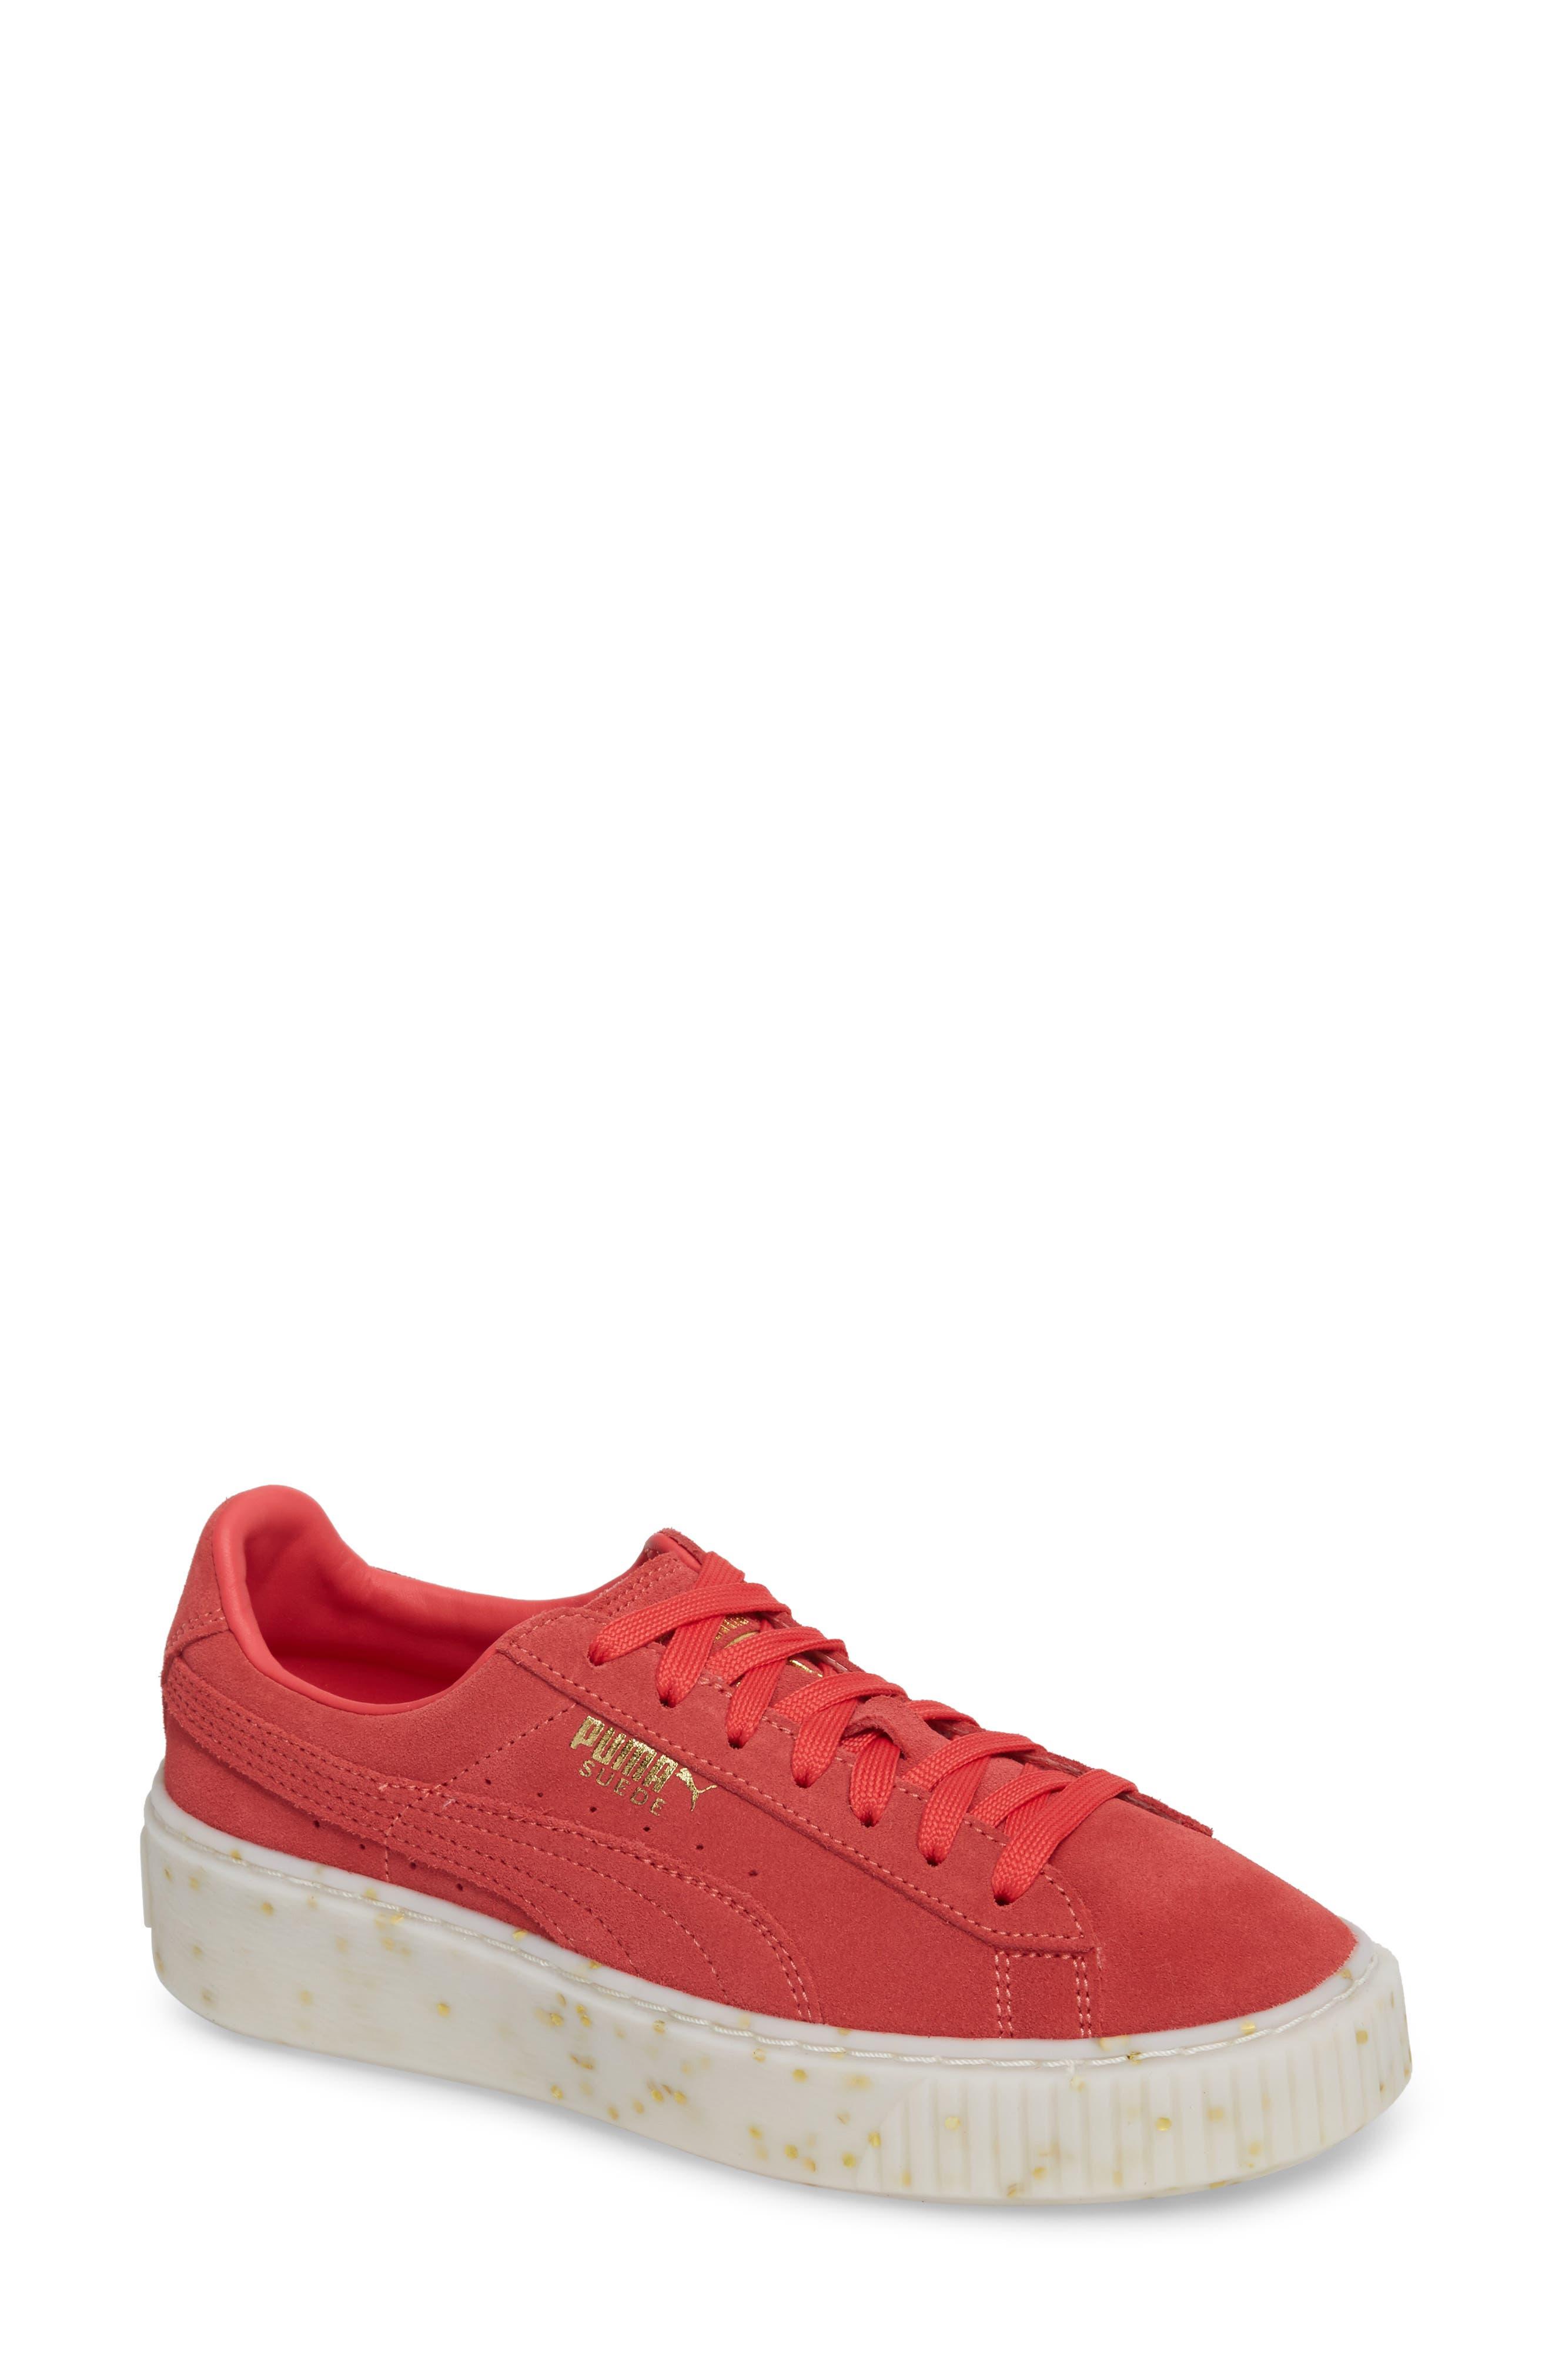 PUMA, Suede Platform Sneaker, Main thumbnail 1, color, PARADISE PINK/ TEAM GOLD